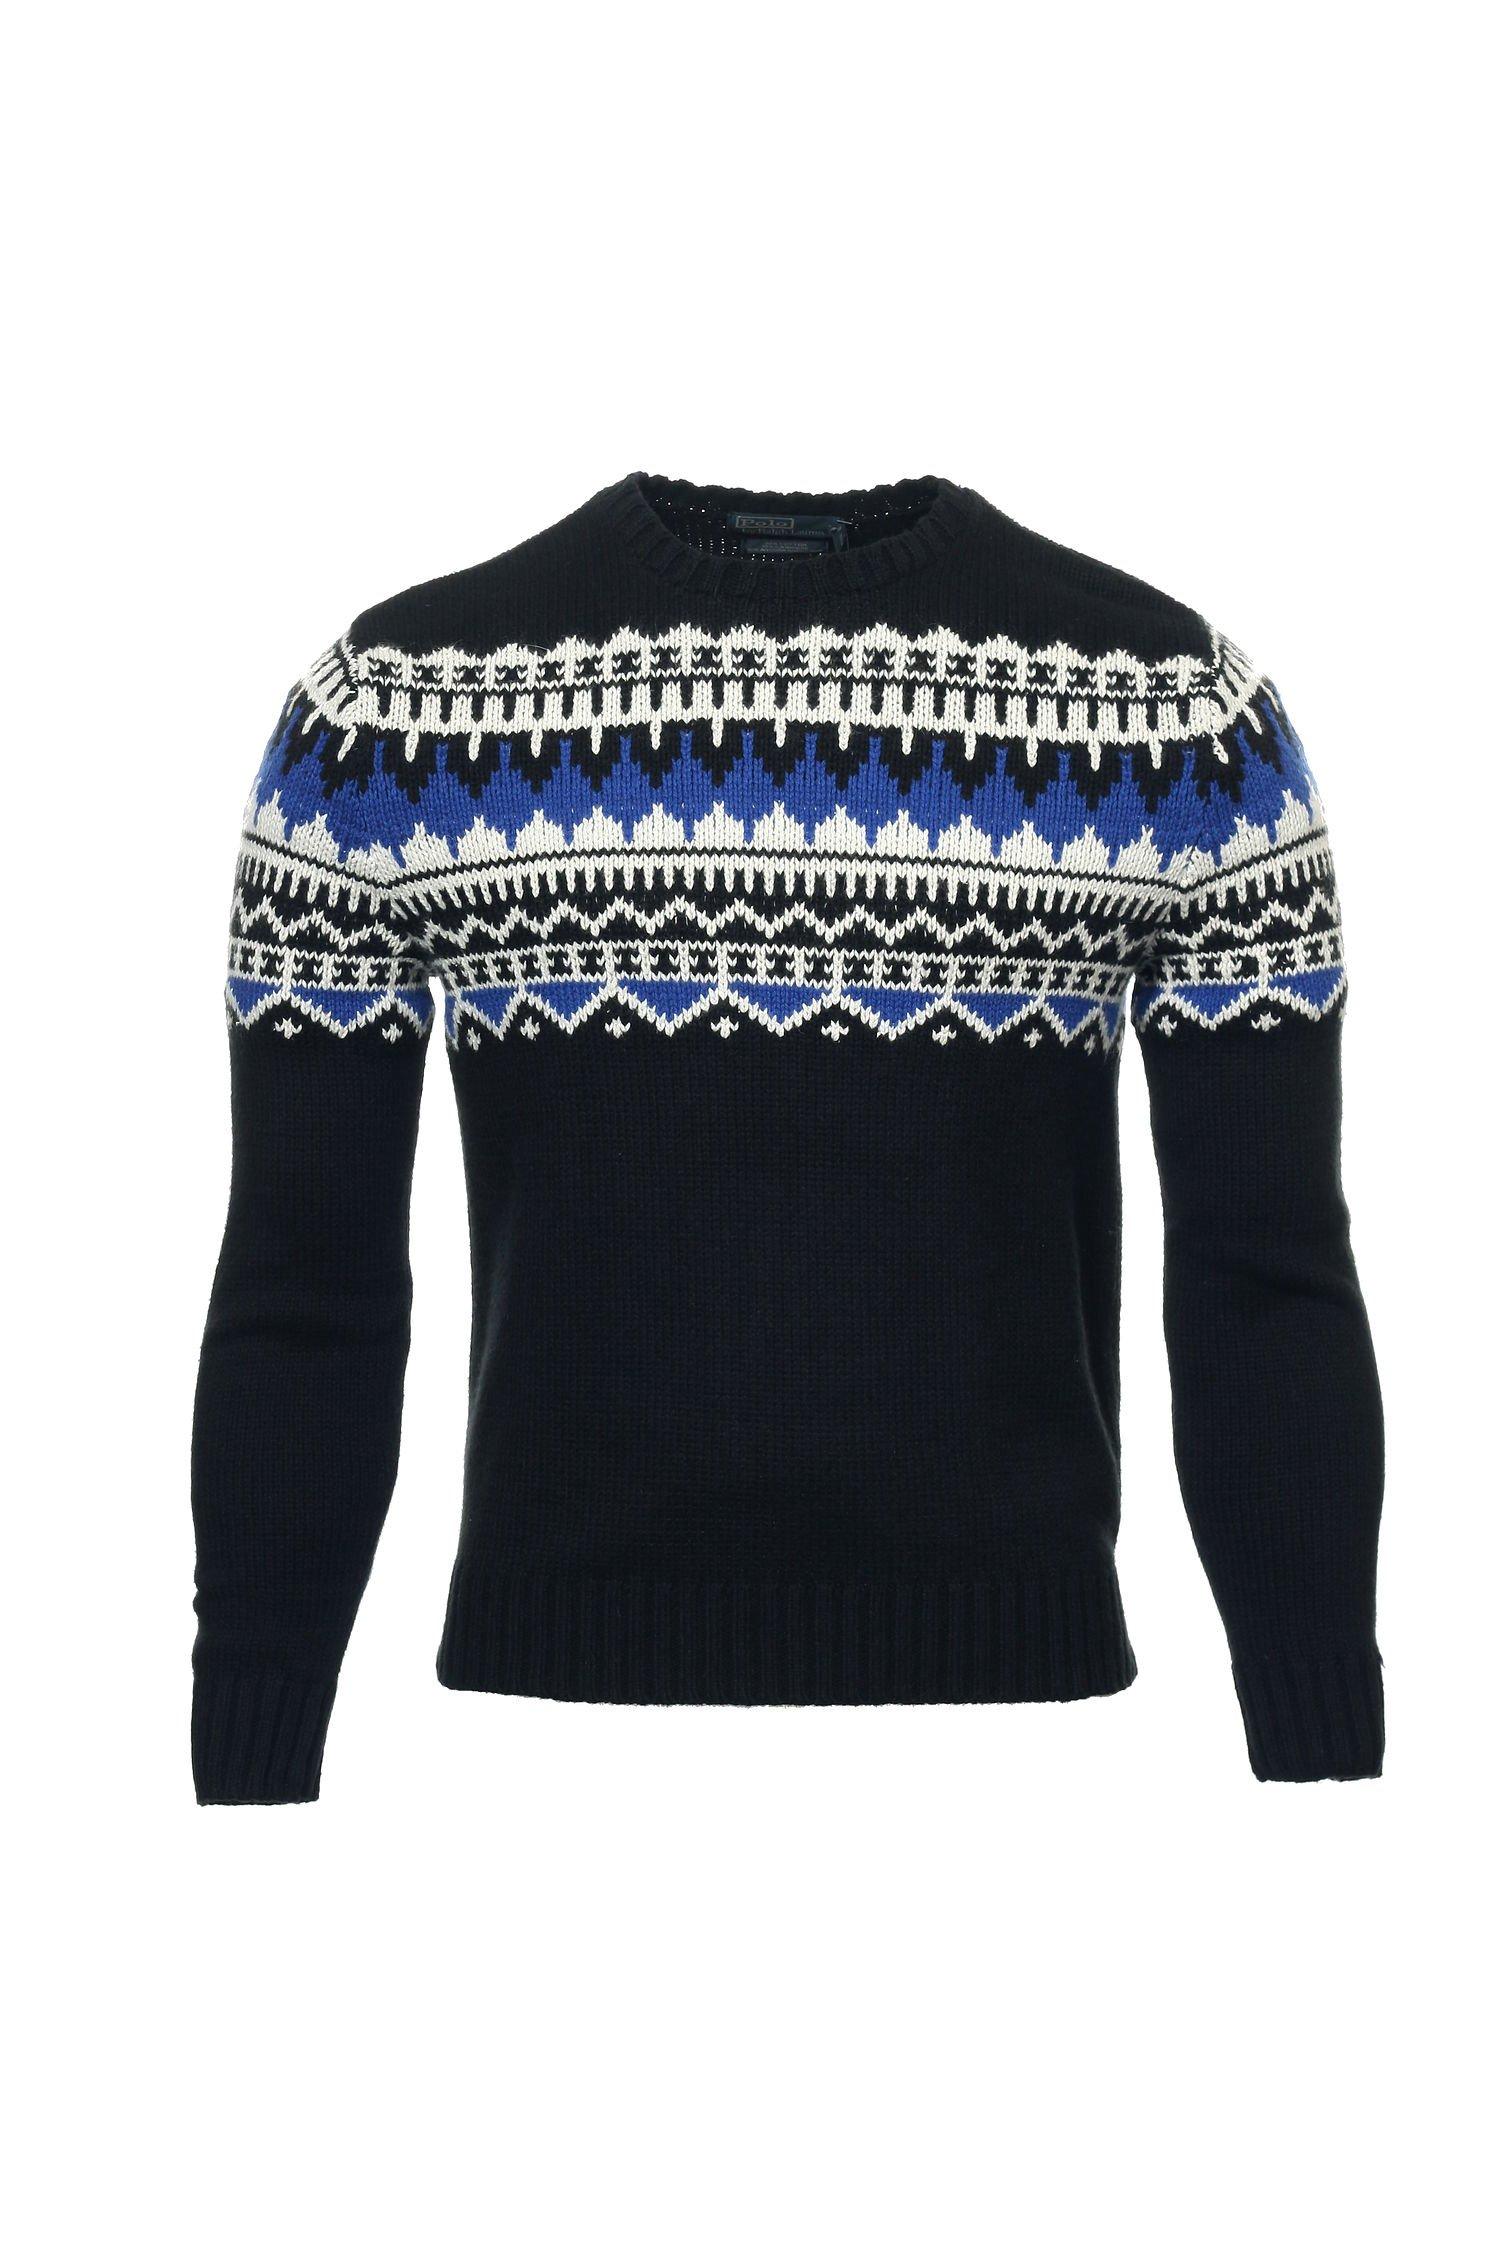 Polo Ralph Lauren Mens Knit Cashmere Blend Crewneck Sweater - XXL - Black/Blue/Cream